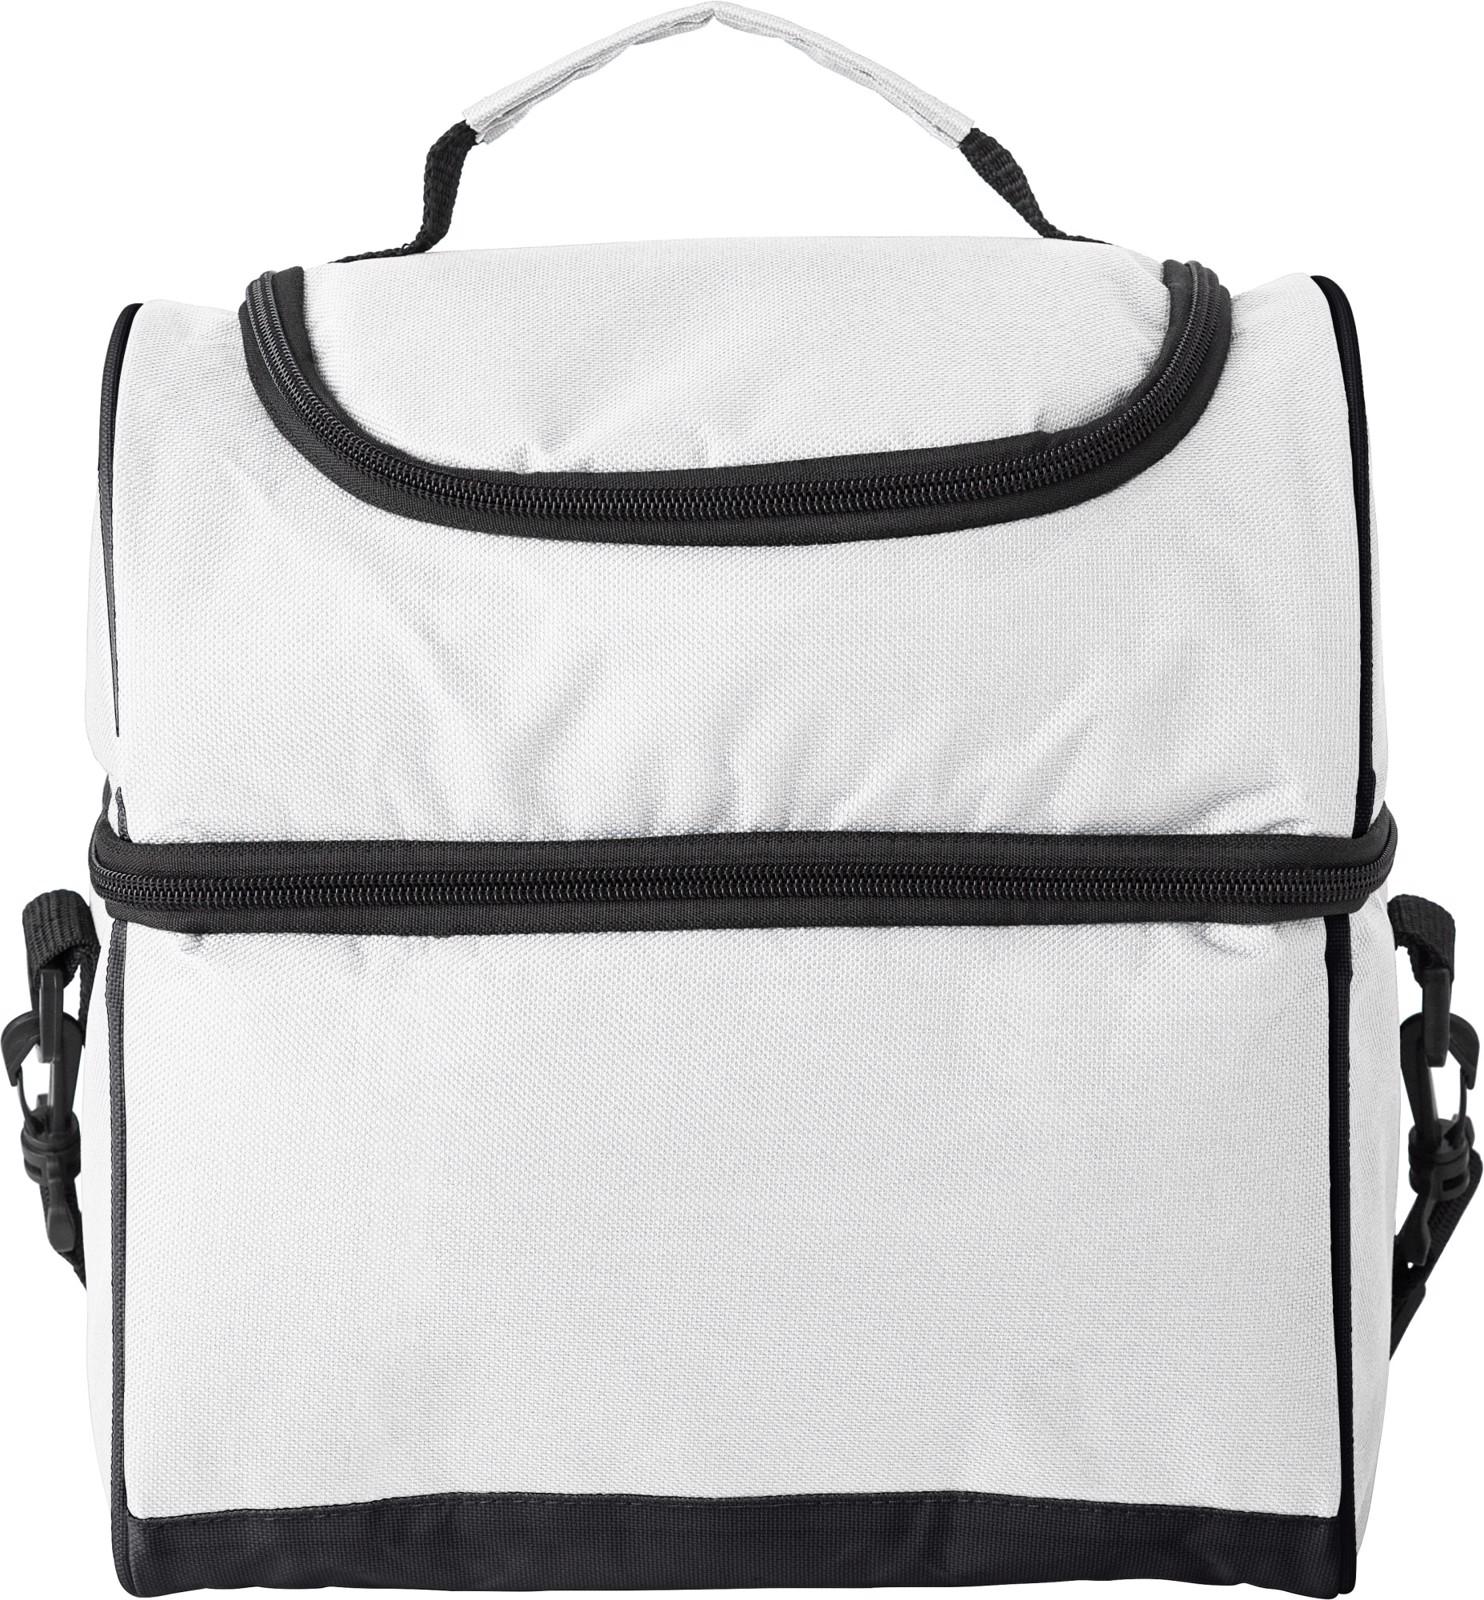 Polyester (600D) cooler bag - White